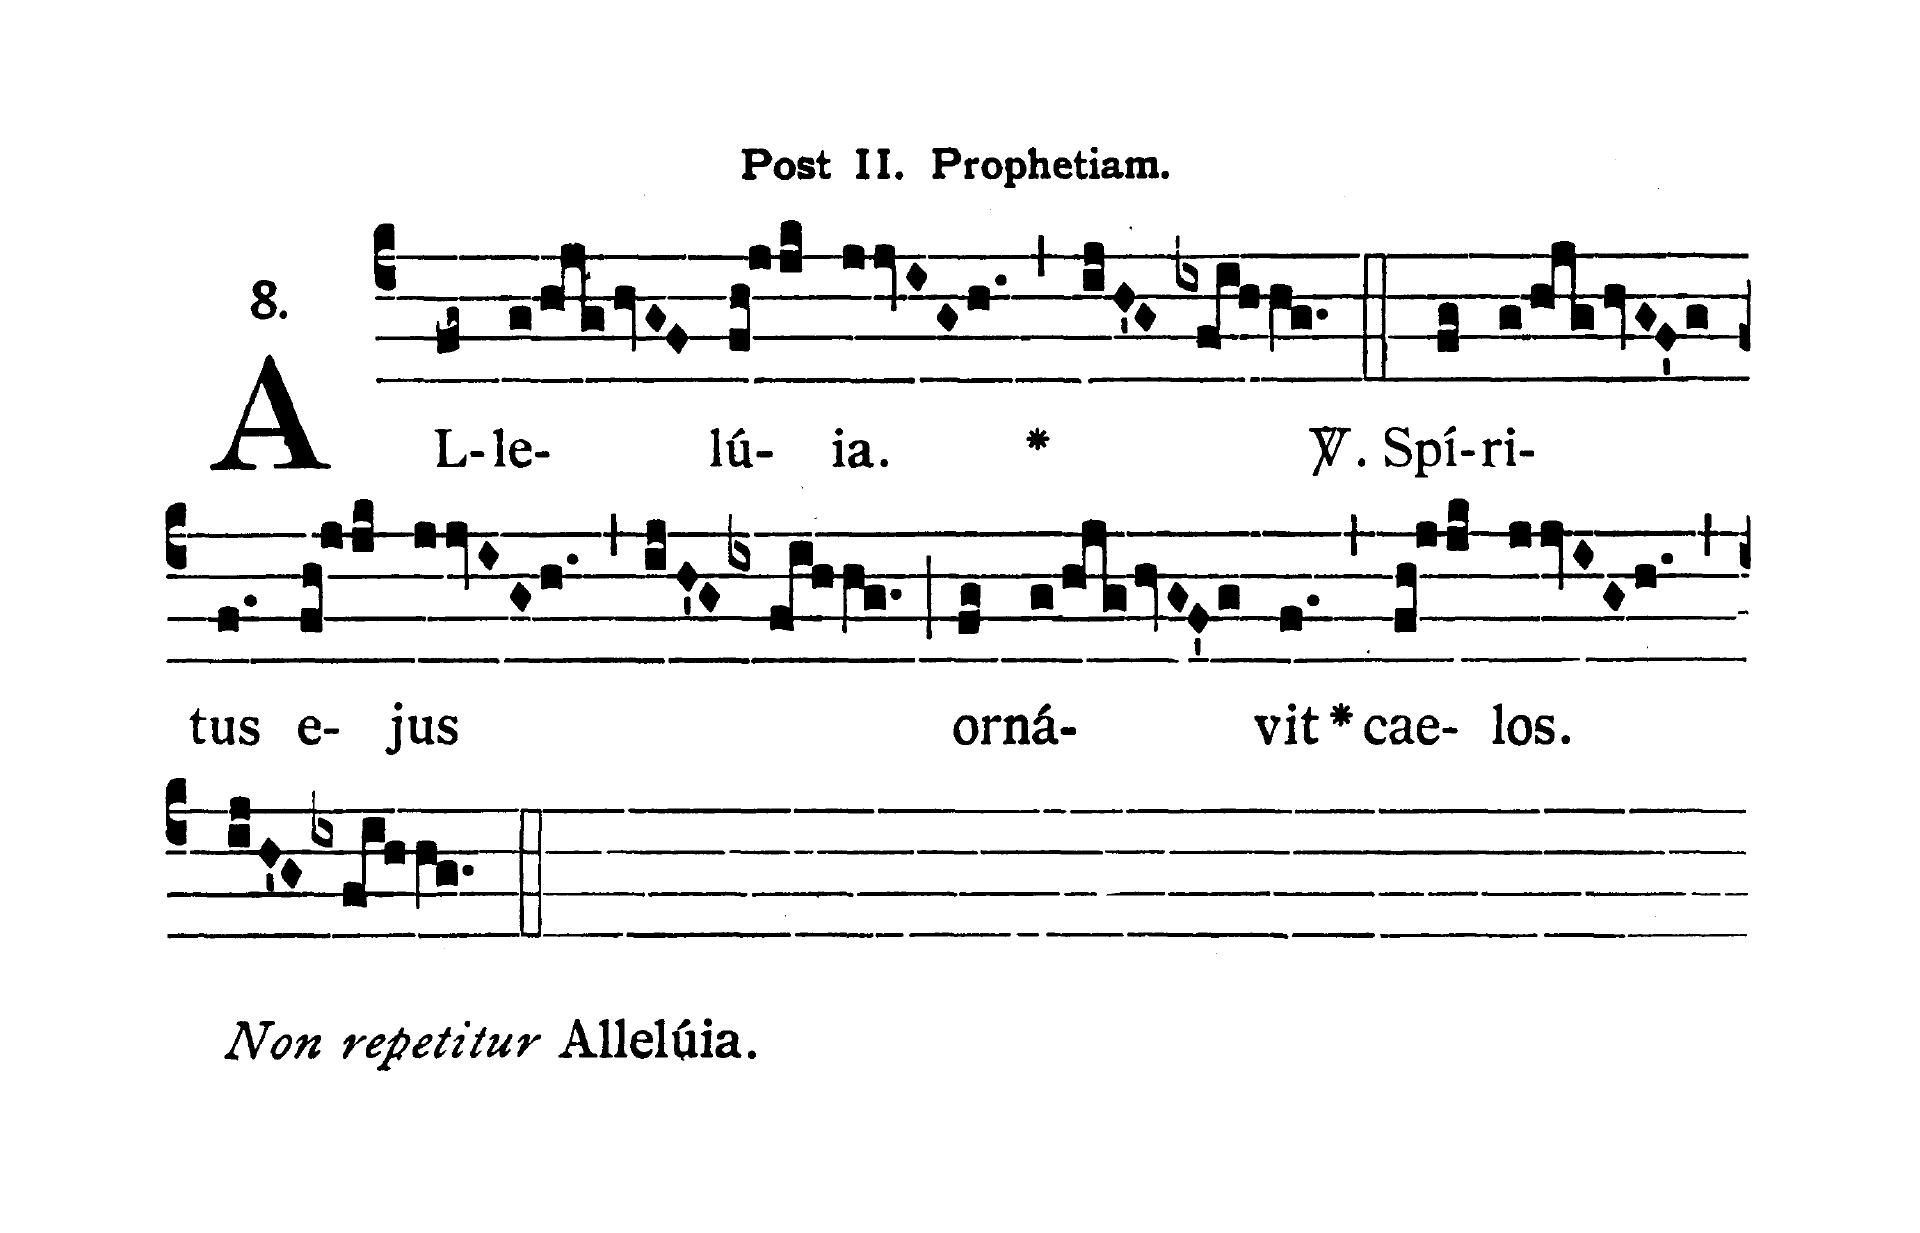 Sabbato infra Octavam Pentecostes (Sobota w oktawie Zesłania Ducha Świętego) - Alleluia secunda (Spiritus ejus ornavit)